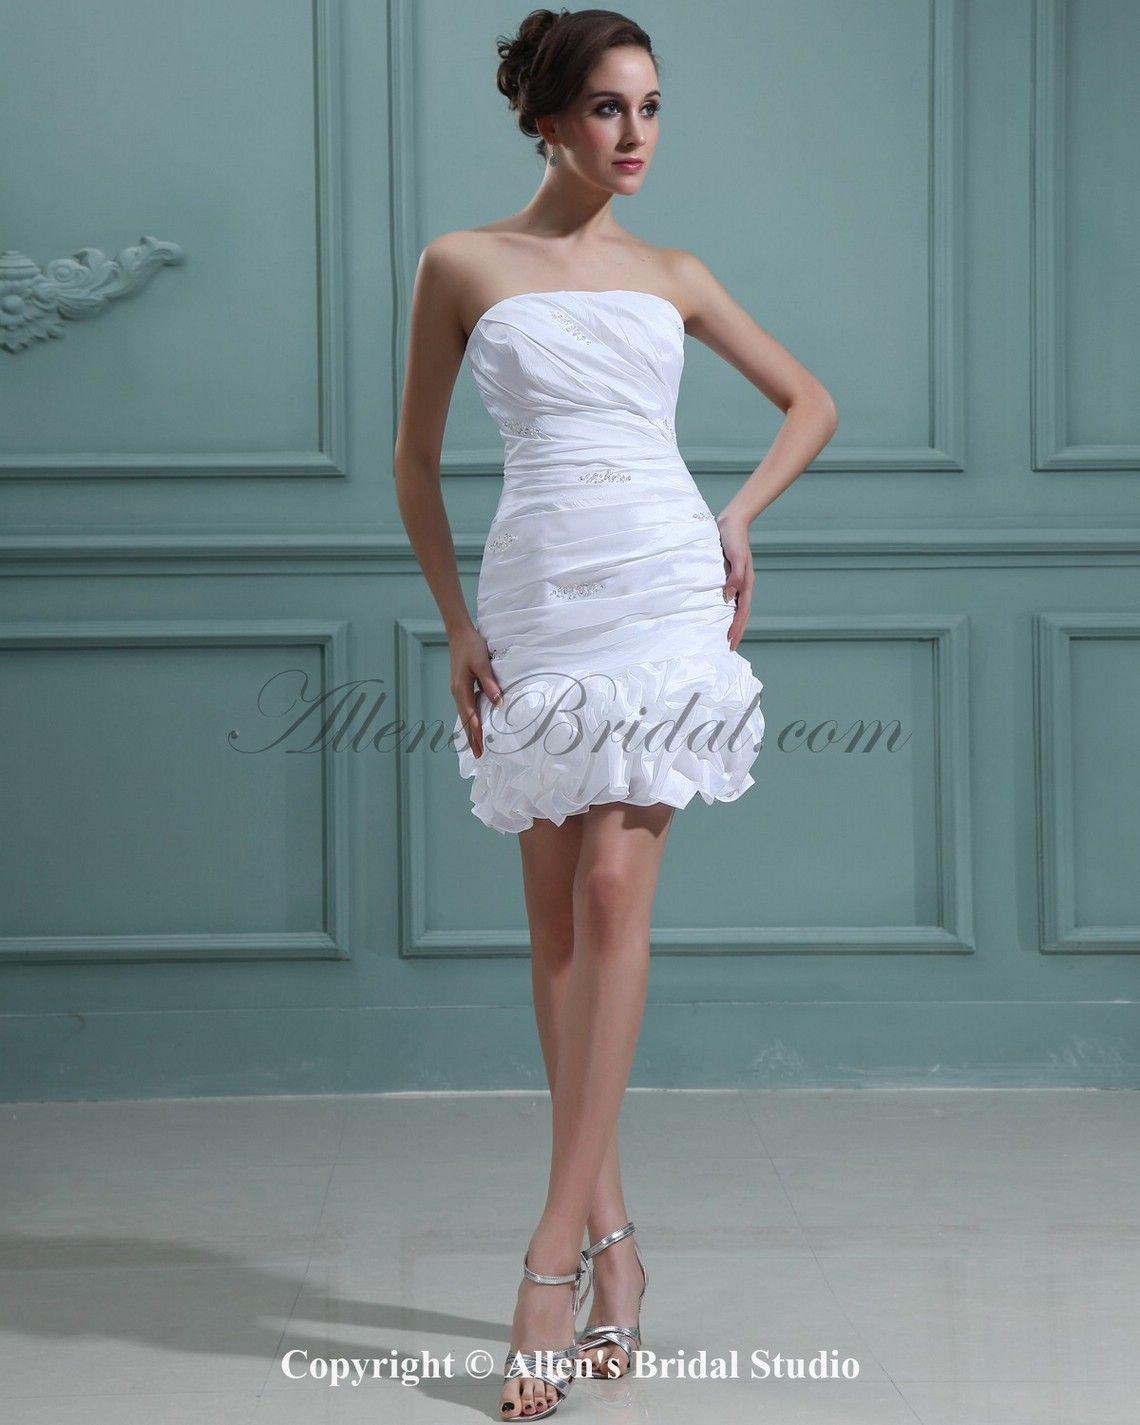 > Wedding Dresses > Short Wedding Dresses > Taffeta Strapless Short ...